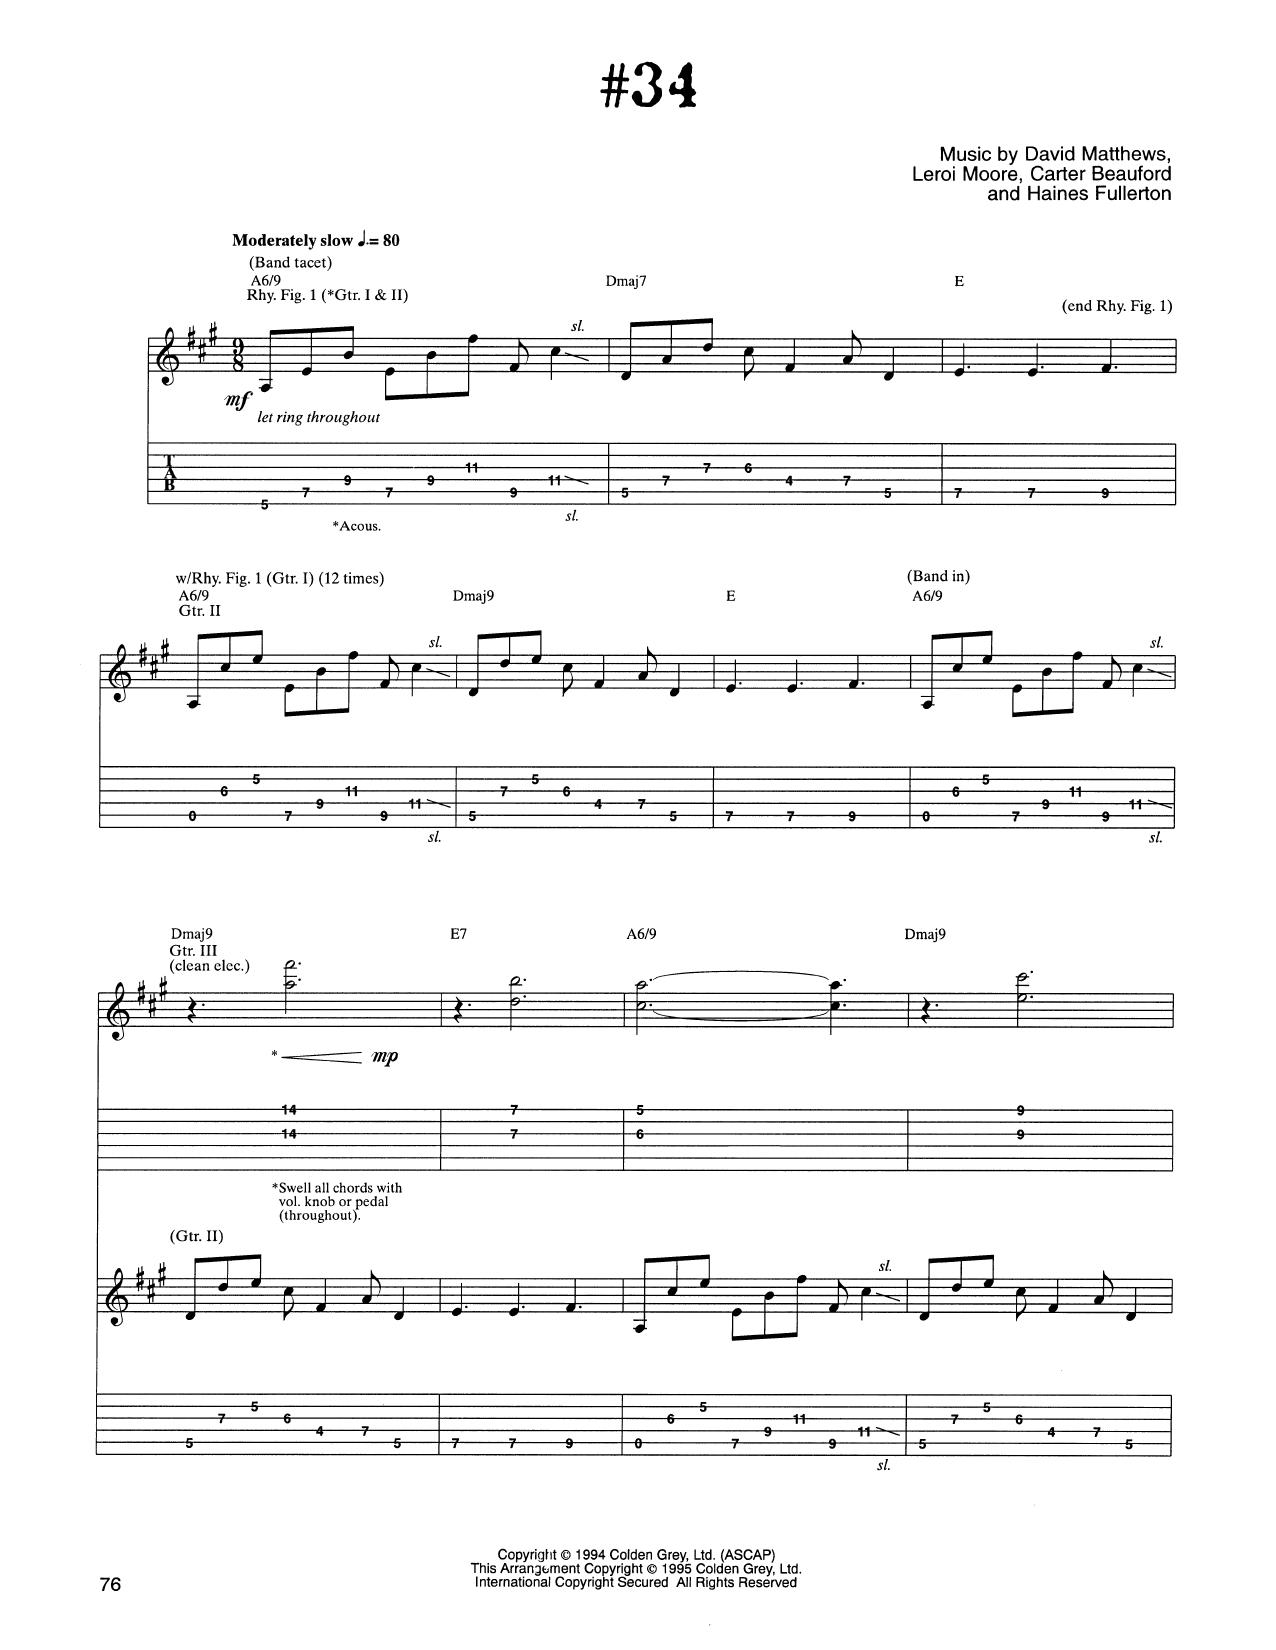 Dave Matthews Band #34 sheet music notes and chords